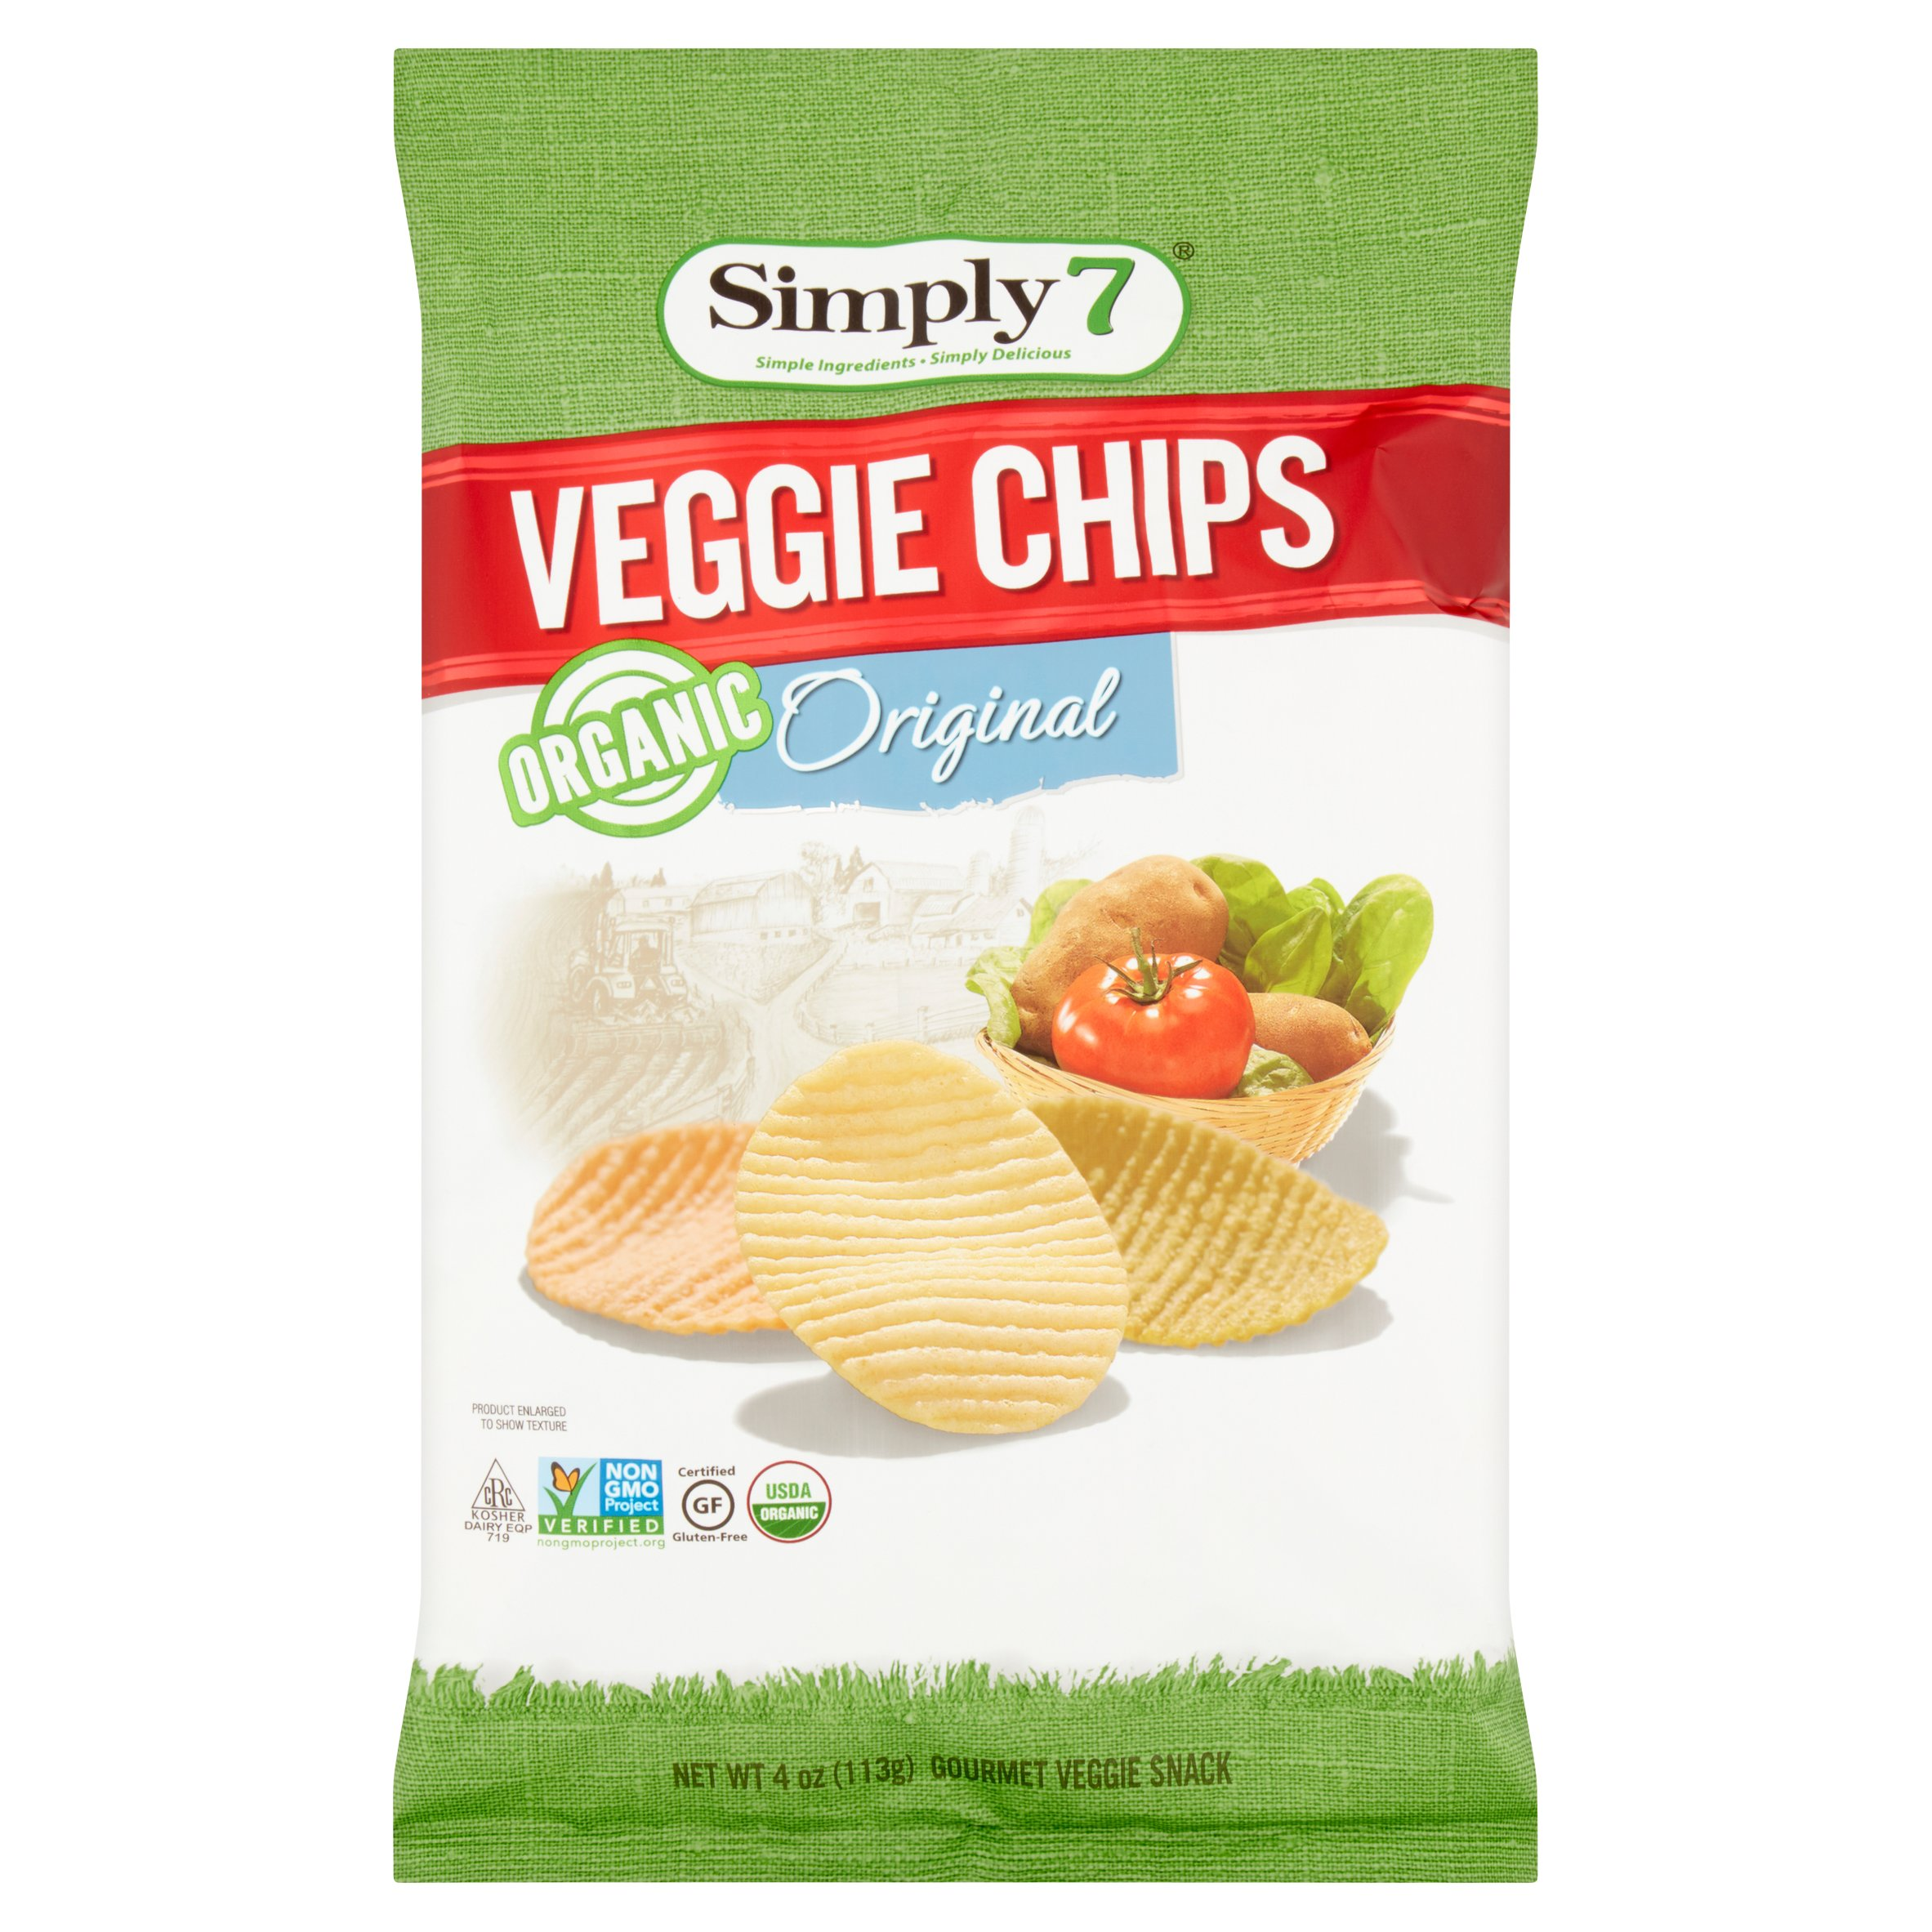 Simply7 Organic Original Veggie Chips, 4 oz, 12 pack